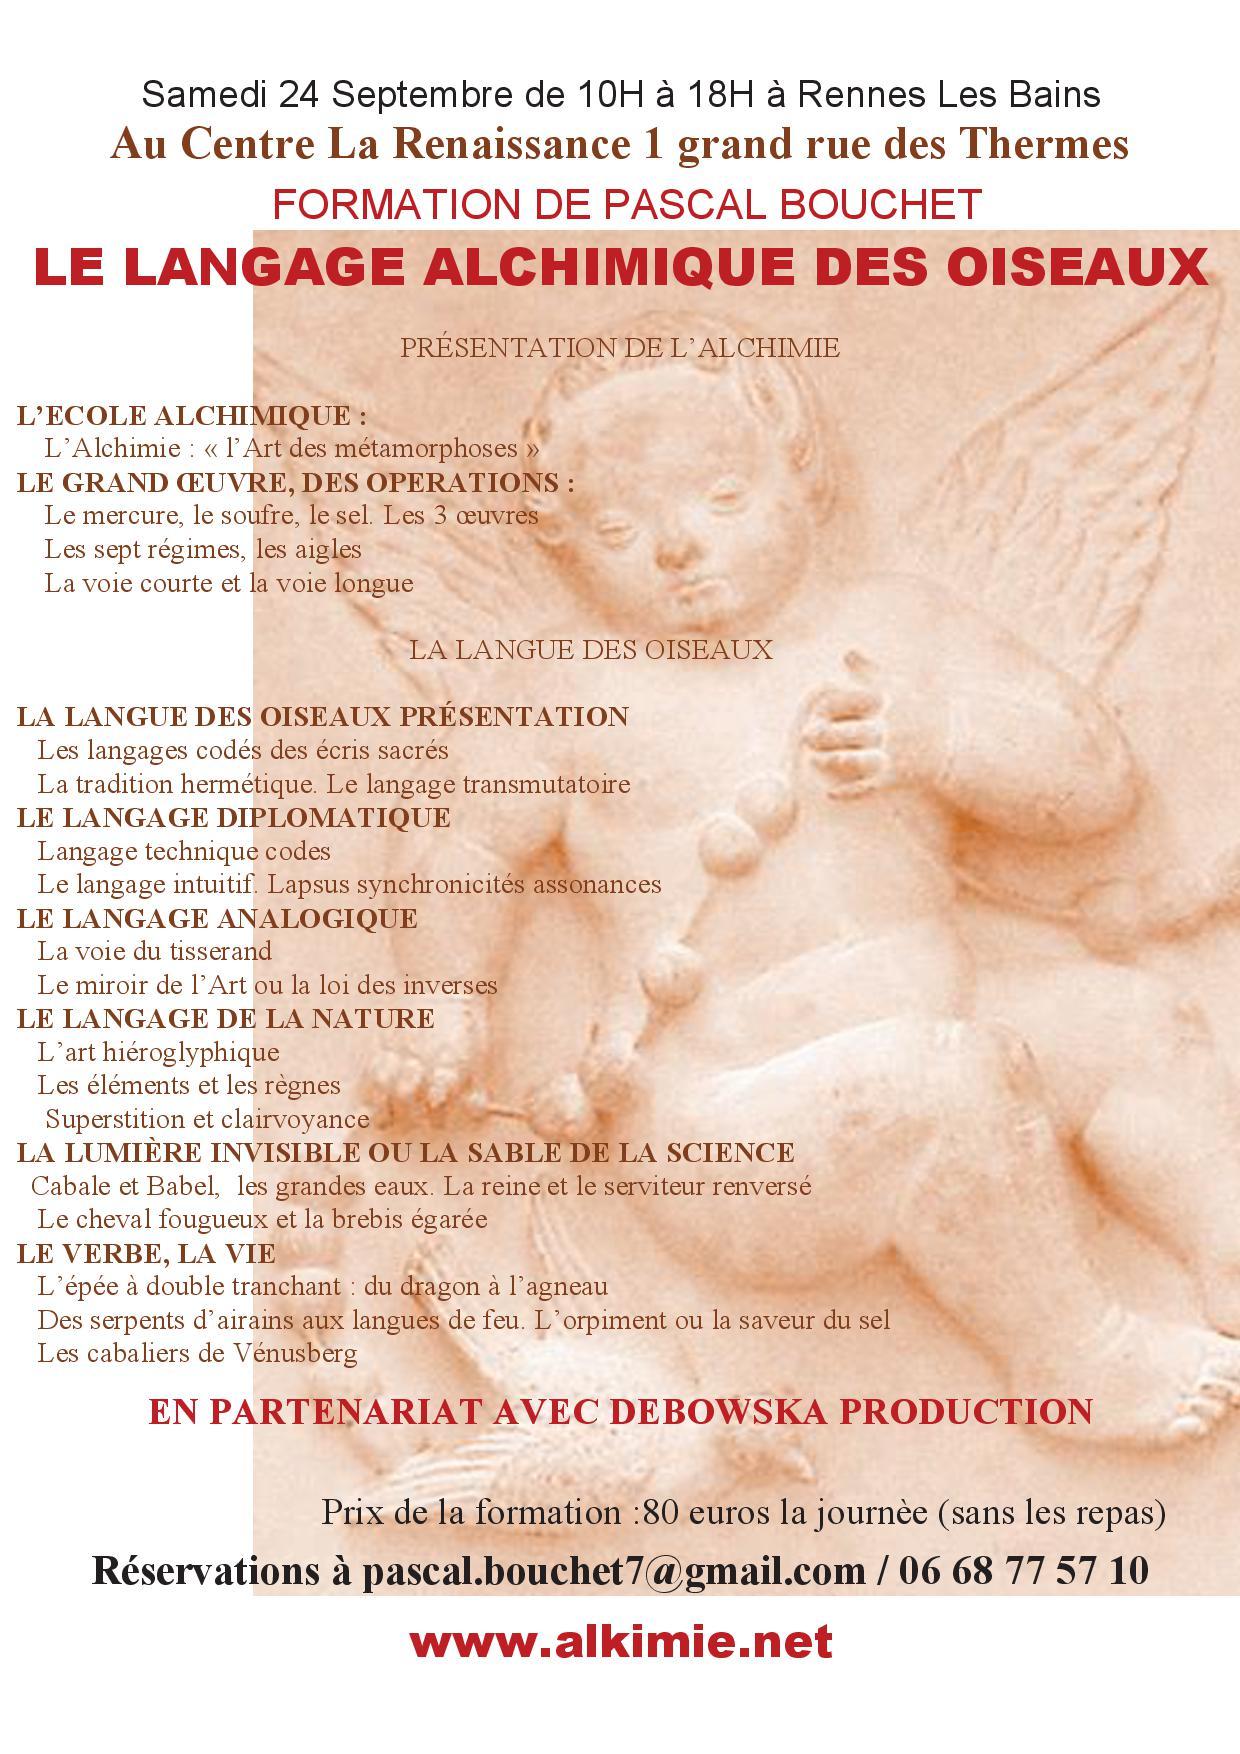 Cours ois debowska 2 24 sept 2016